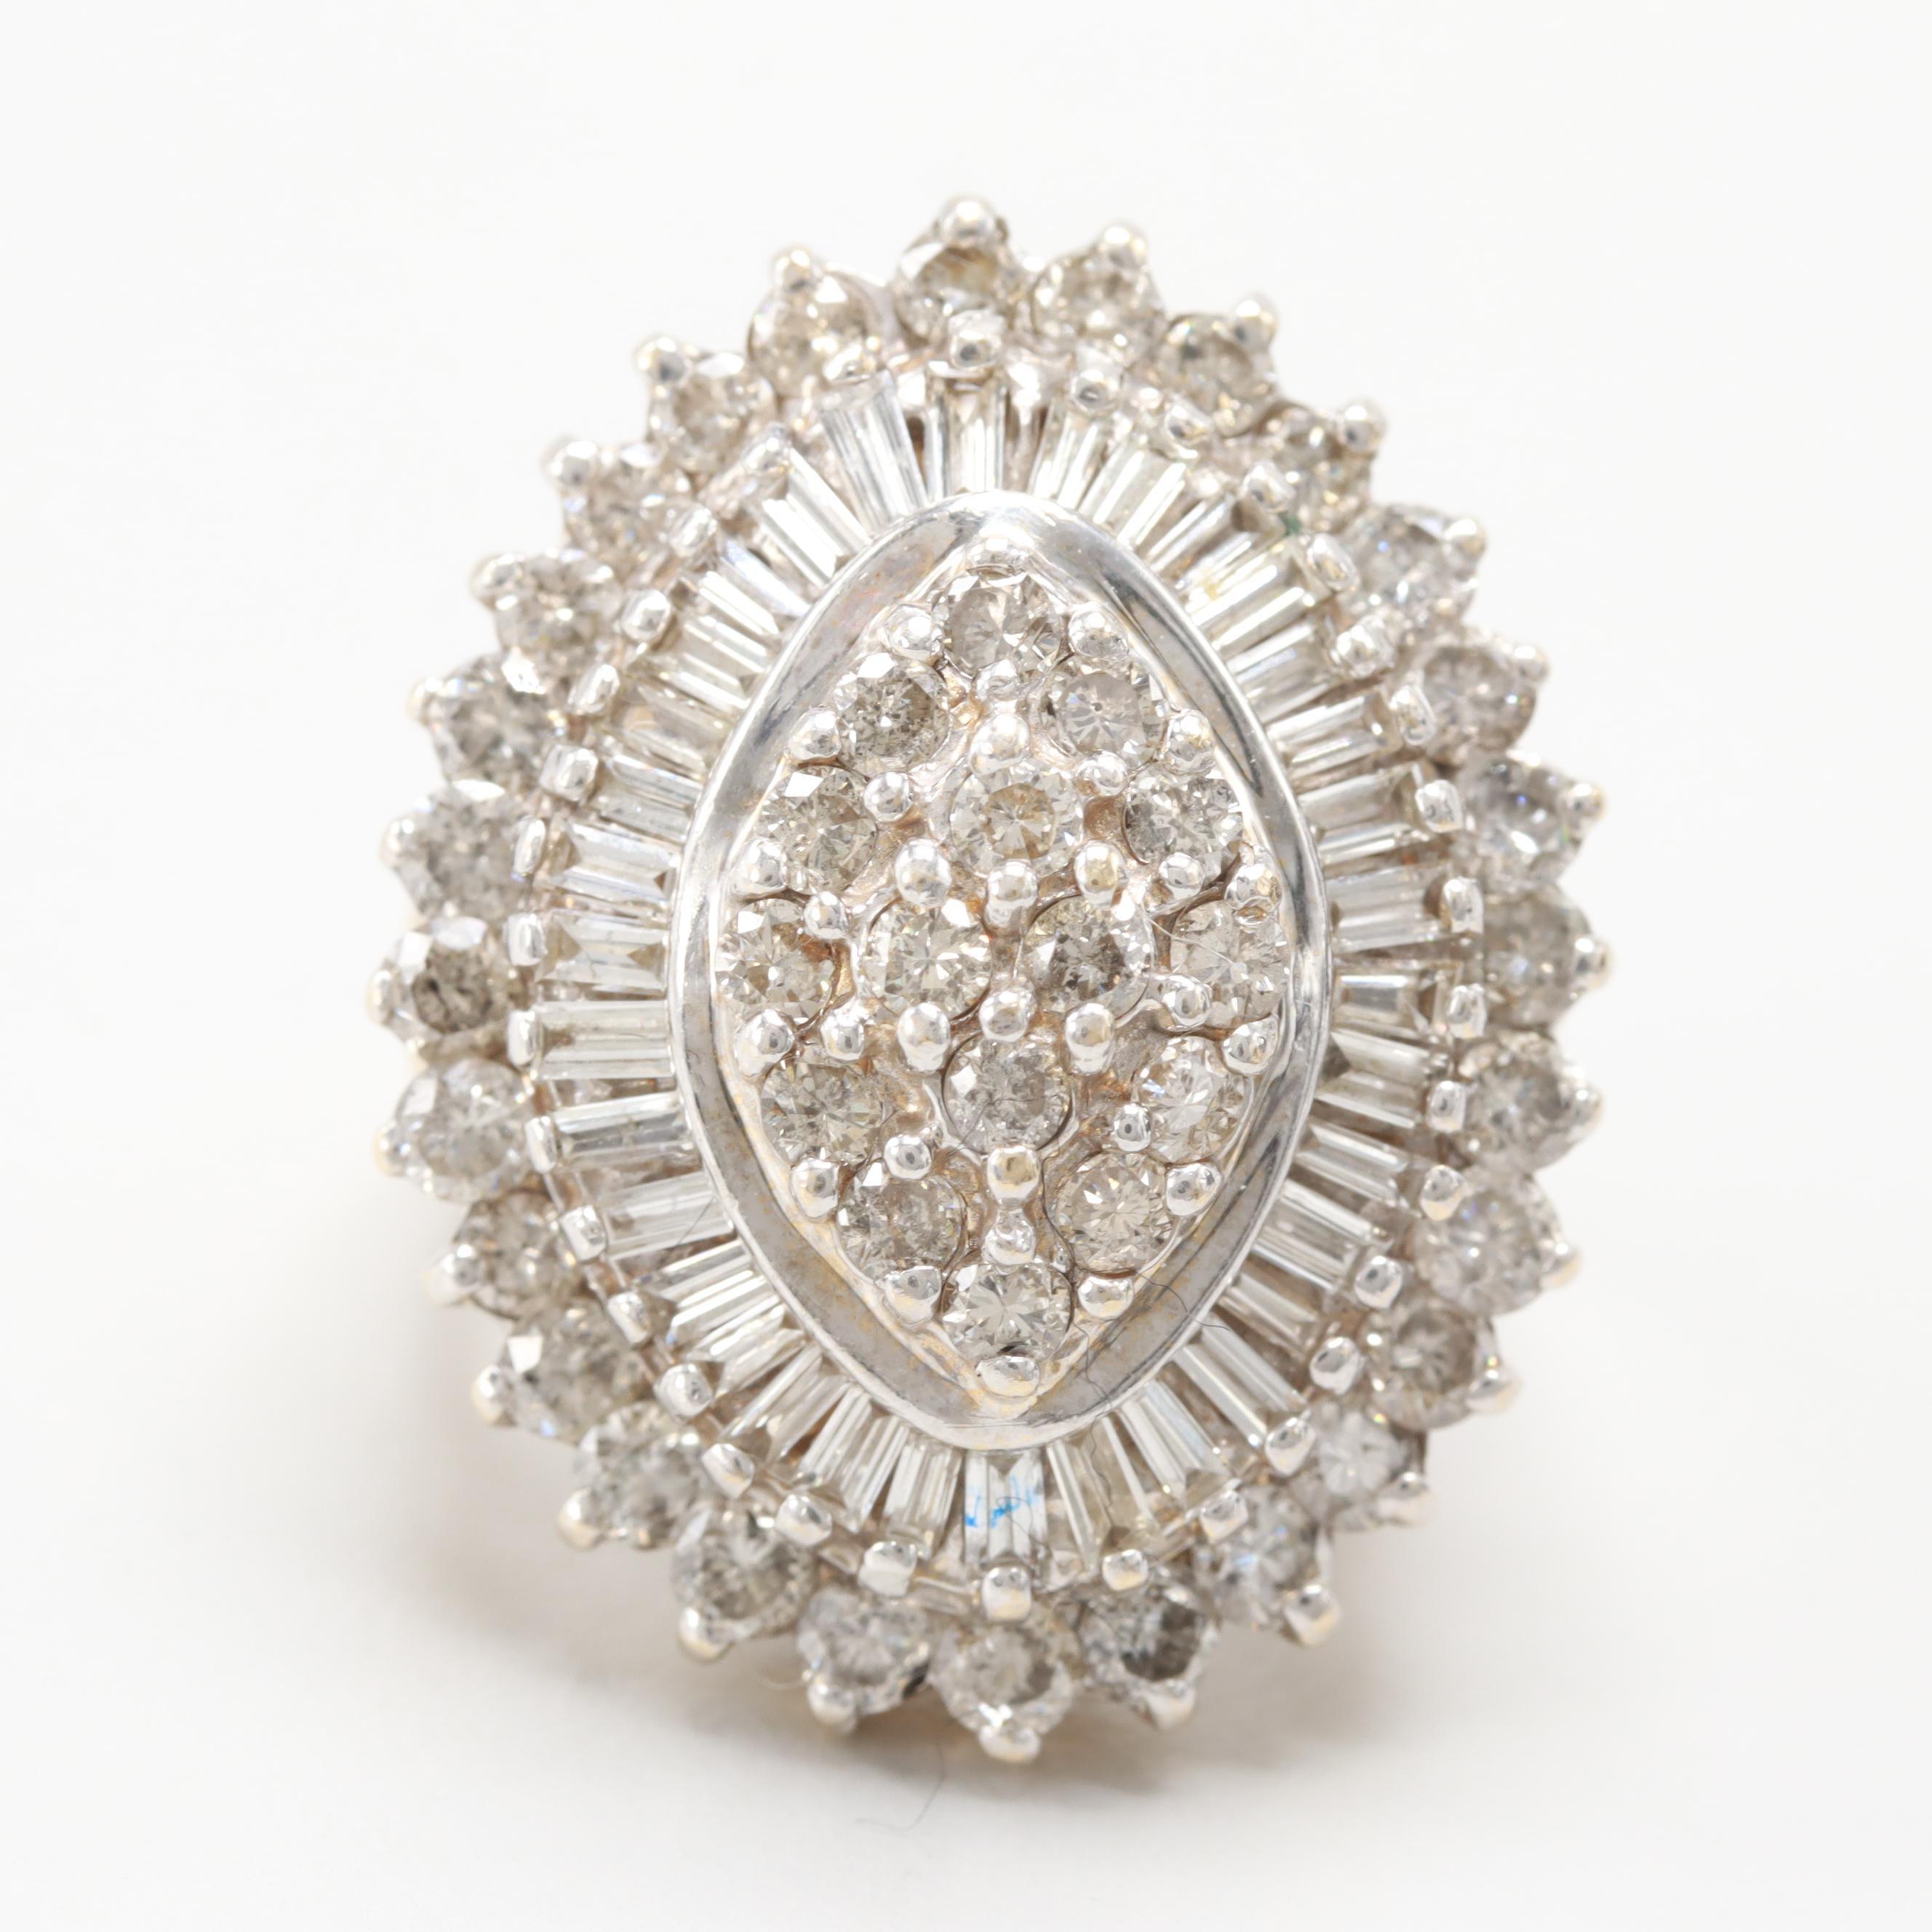 14K Yellow Gold 3.19 CTW Diamond Ring